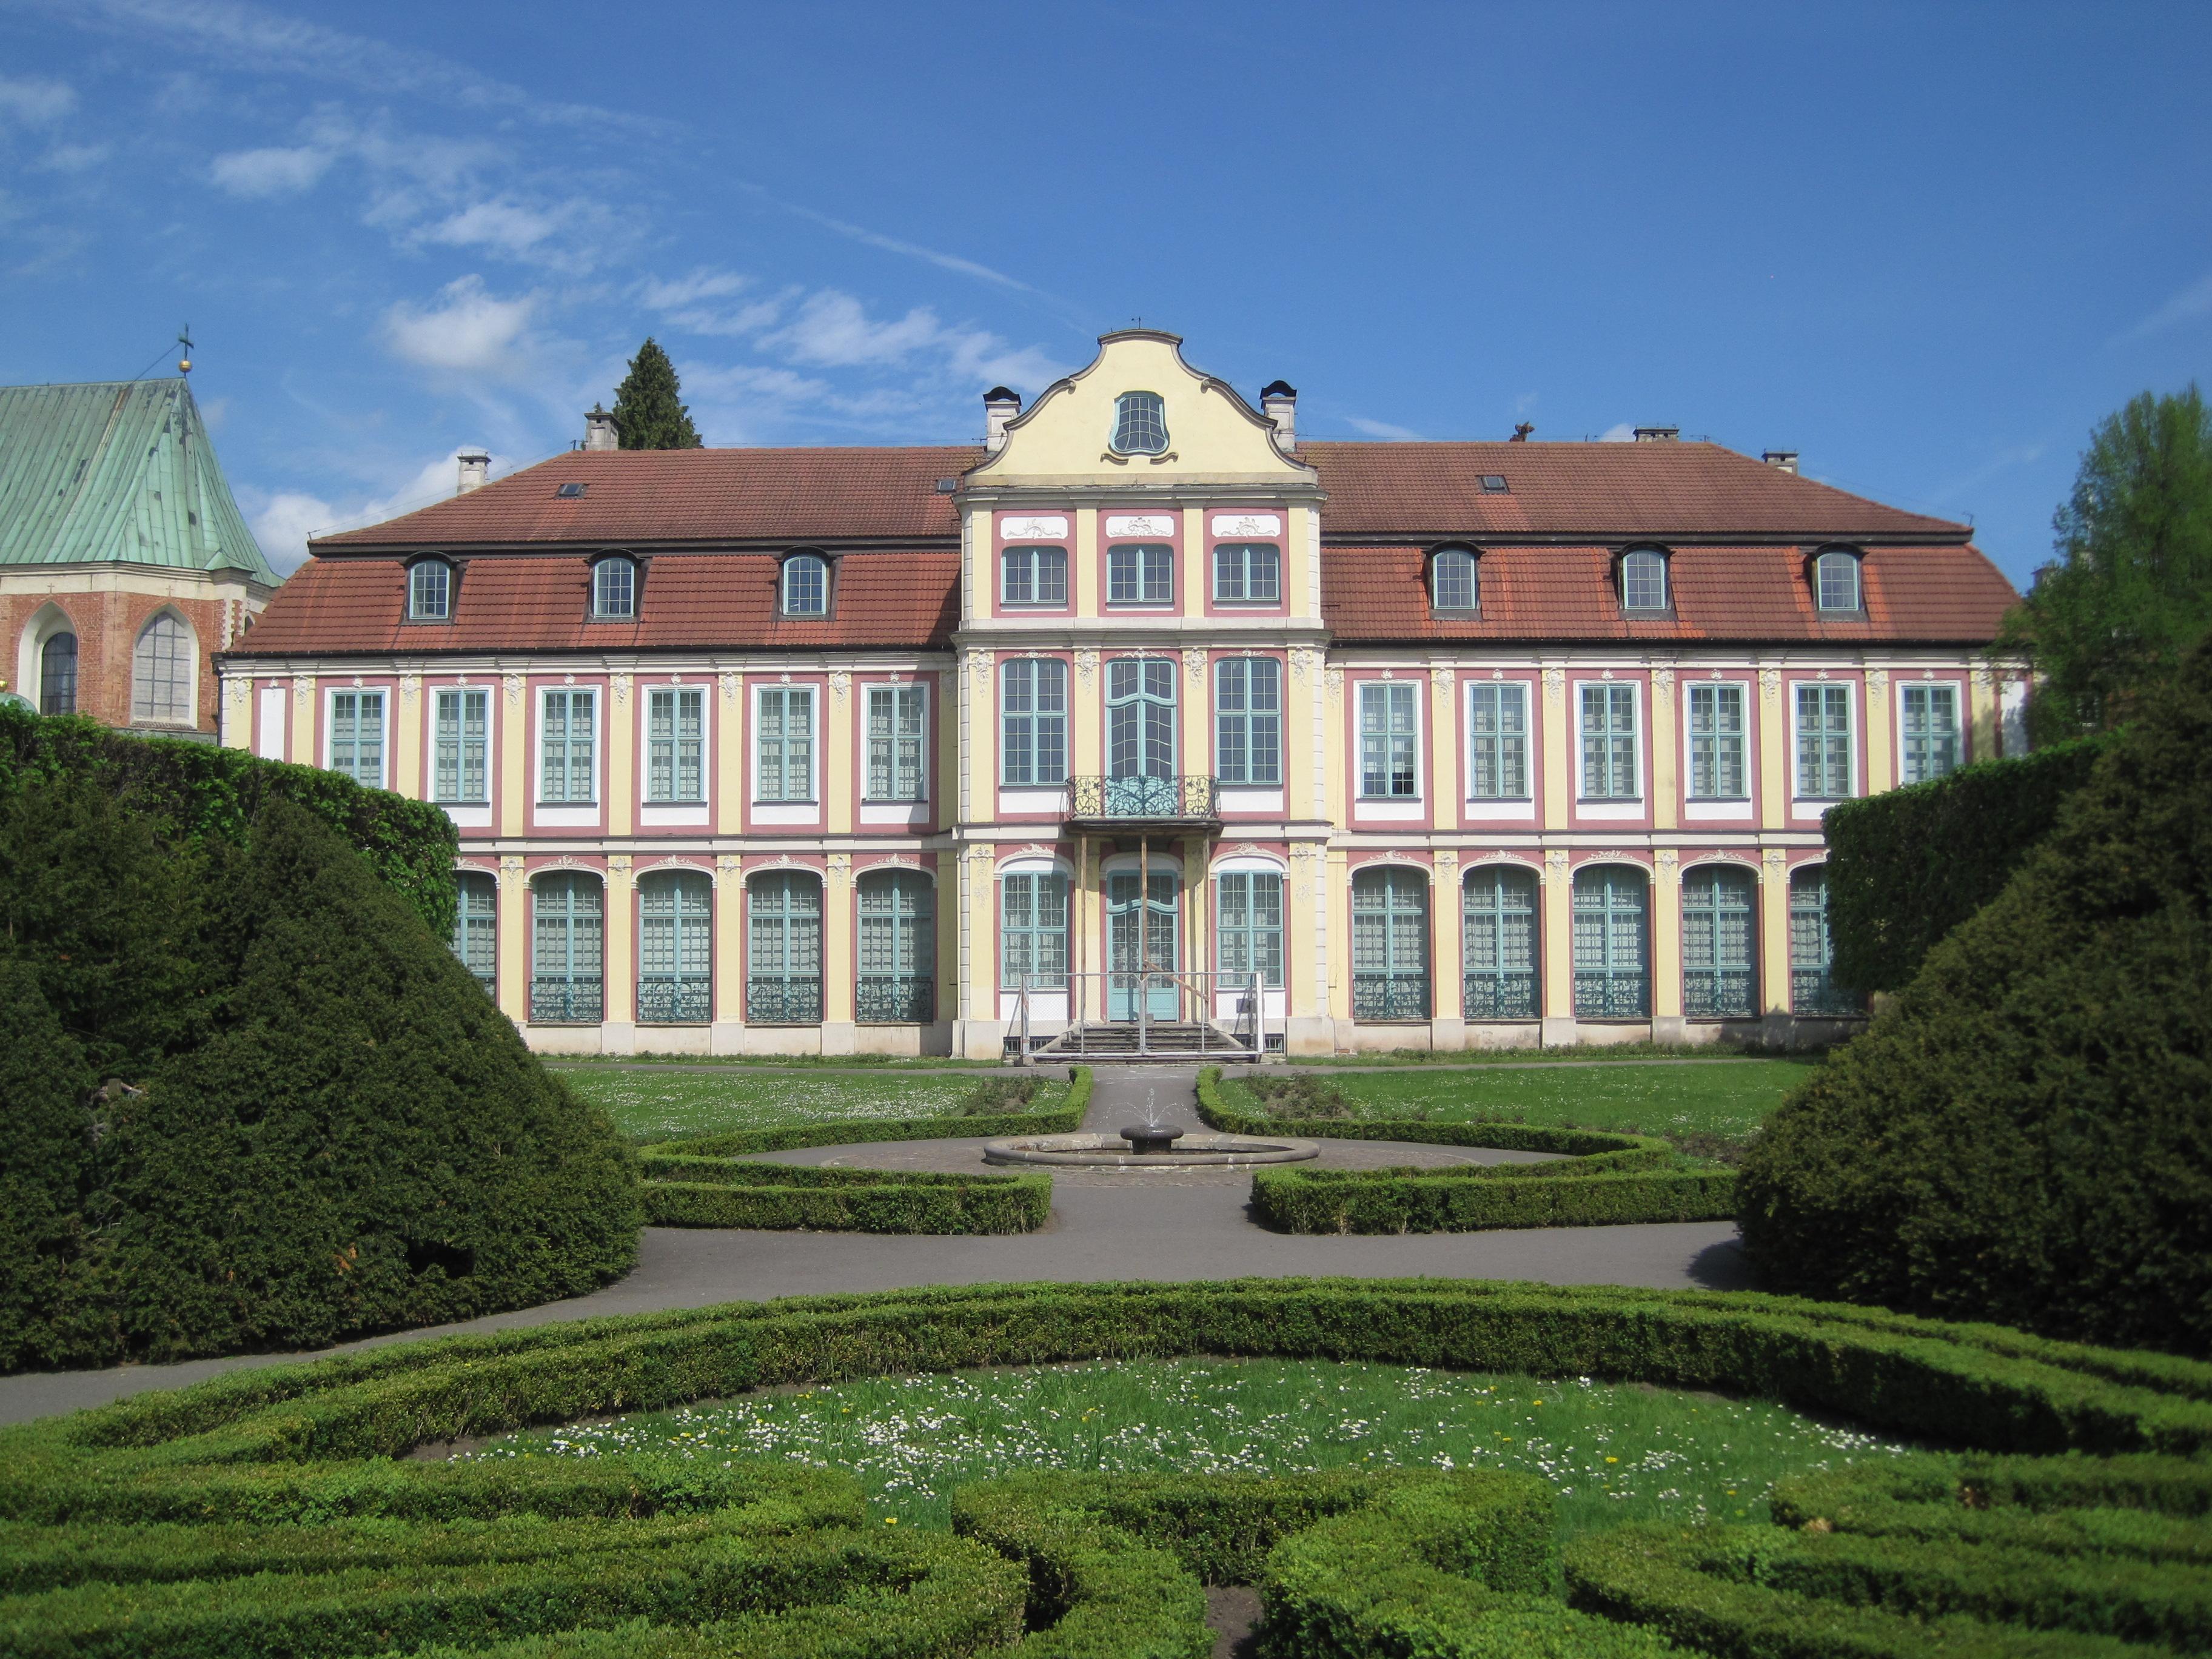 Oliwa Palace in Gdańsk074.JPG